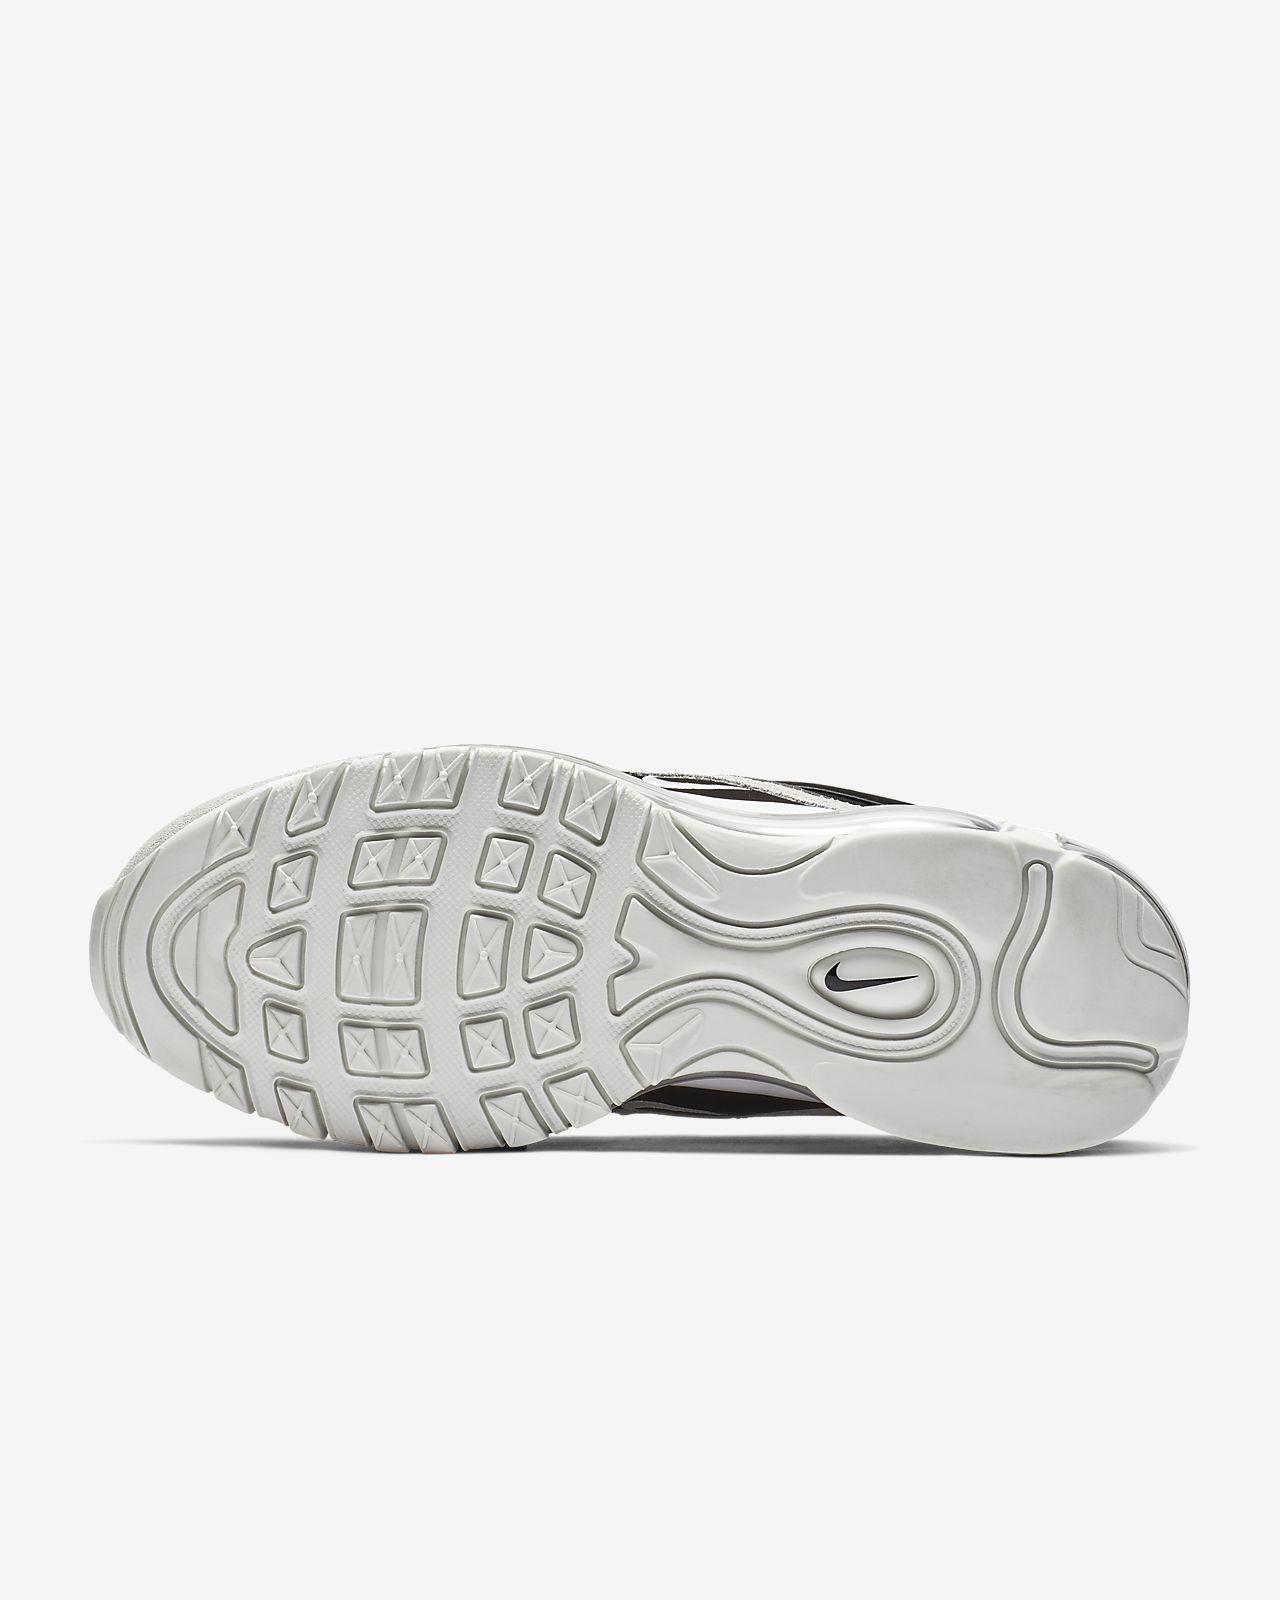 619608d2f917 Nike Air Max 97 Premium Women s Shoe. Nike.com CH